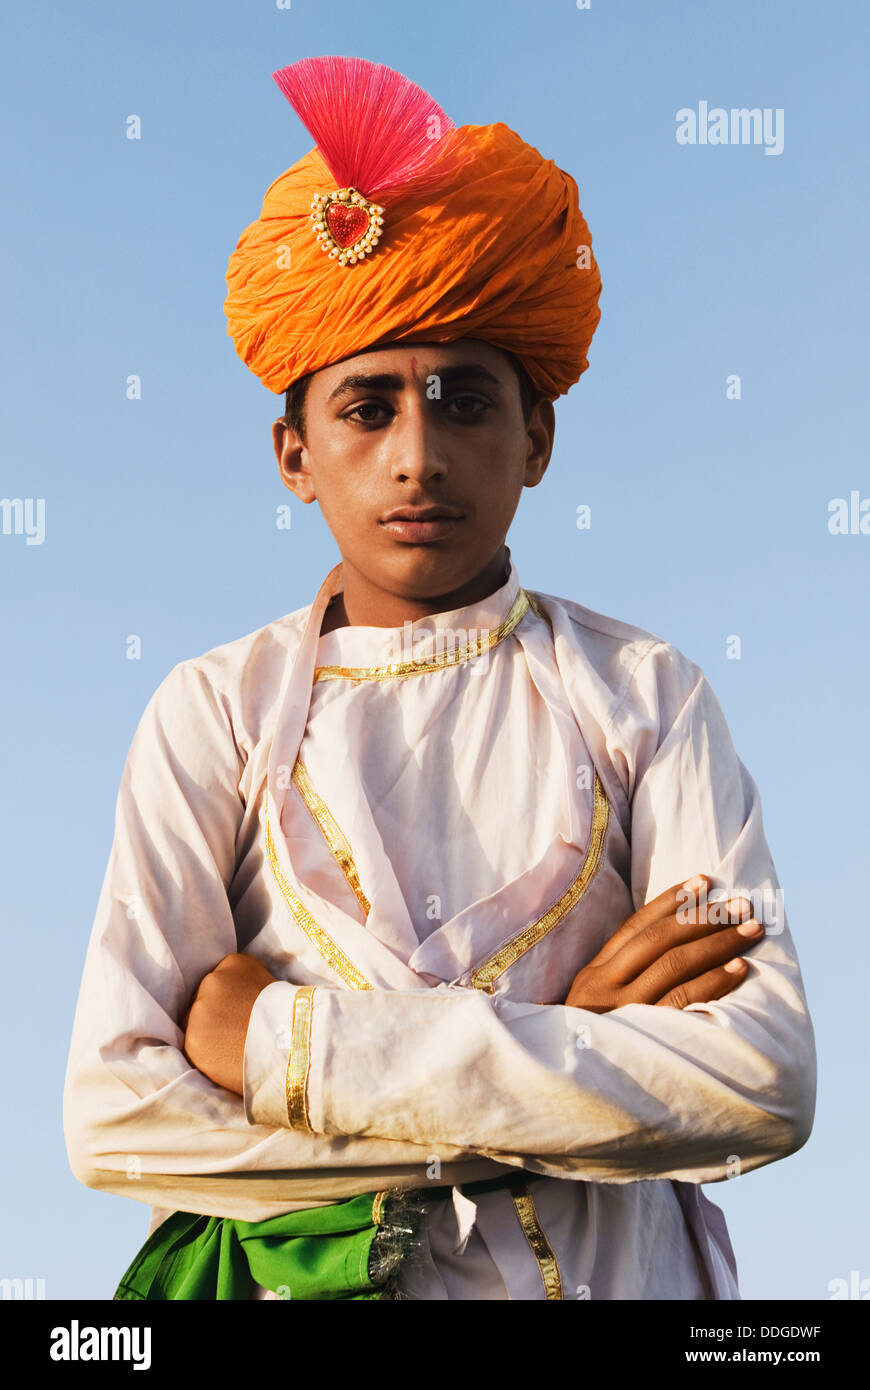 Portrait d'un homme en robe traditionnelle du Rajasthan, Jaipur, Rajasthan, Inde Banque D'Images